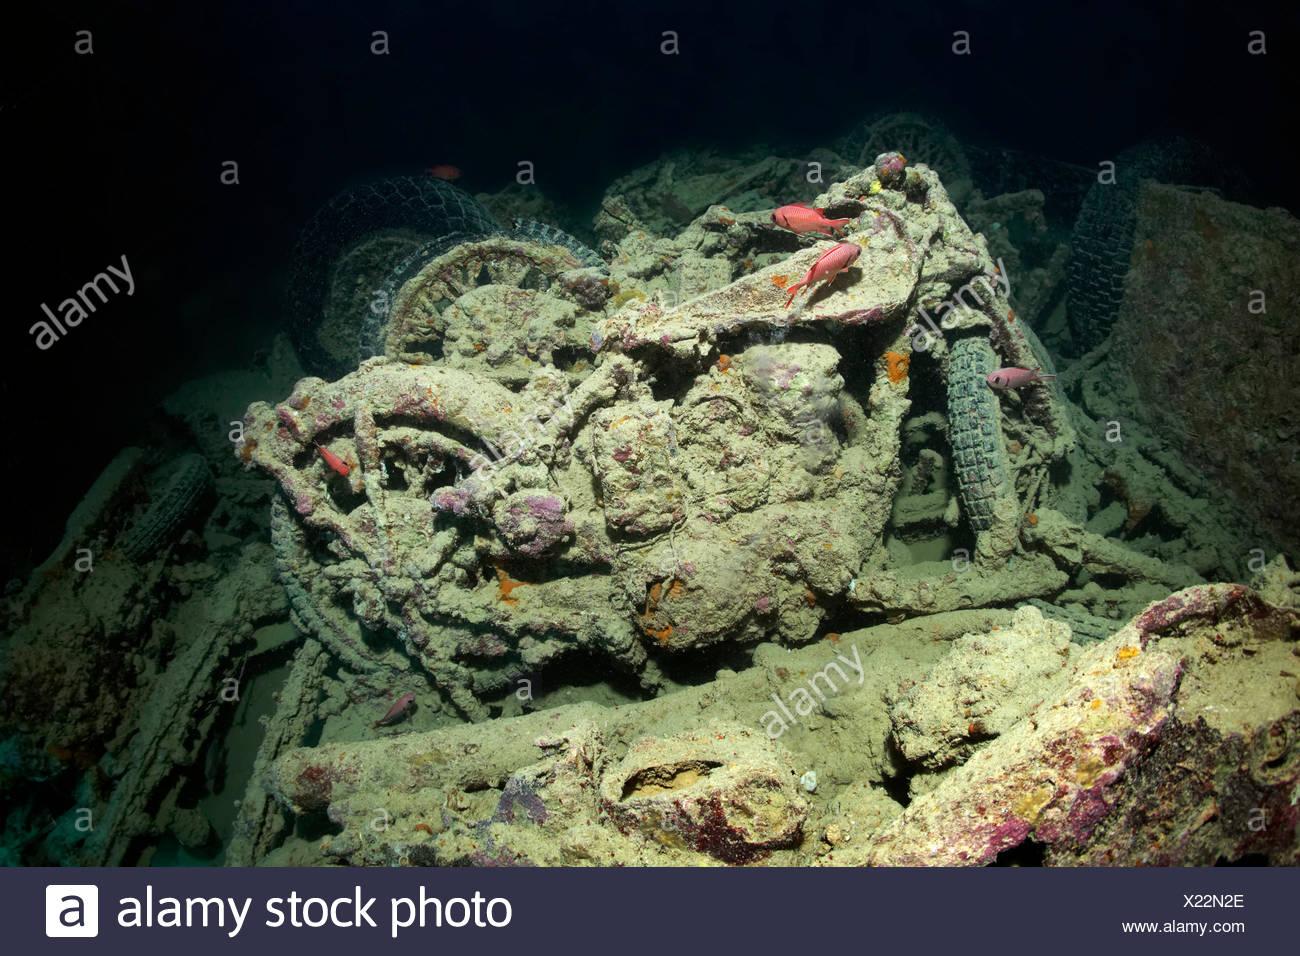 British Small Arms BSA M-20 Motorrad, Ladung auf das Wrack der SS Thistlegorm, Rotes Meer, Shaab Ali Sinai-Halbinsel, Ägypten Stockbild